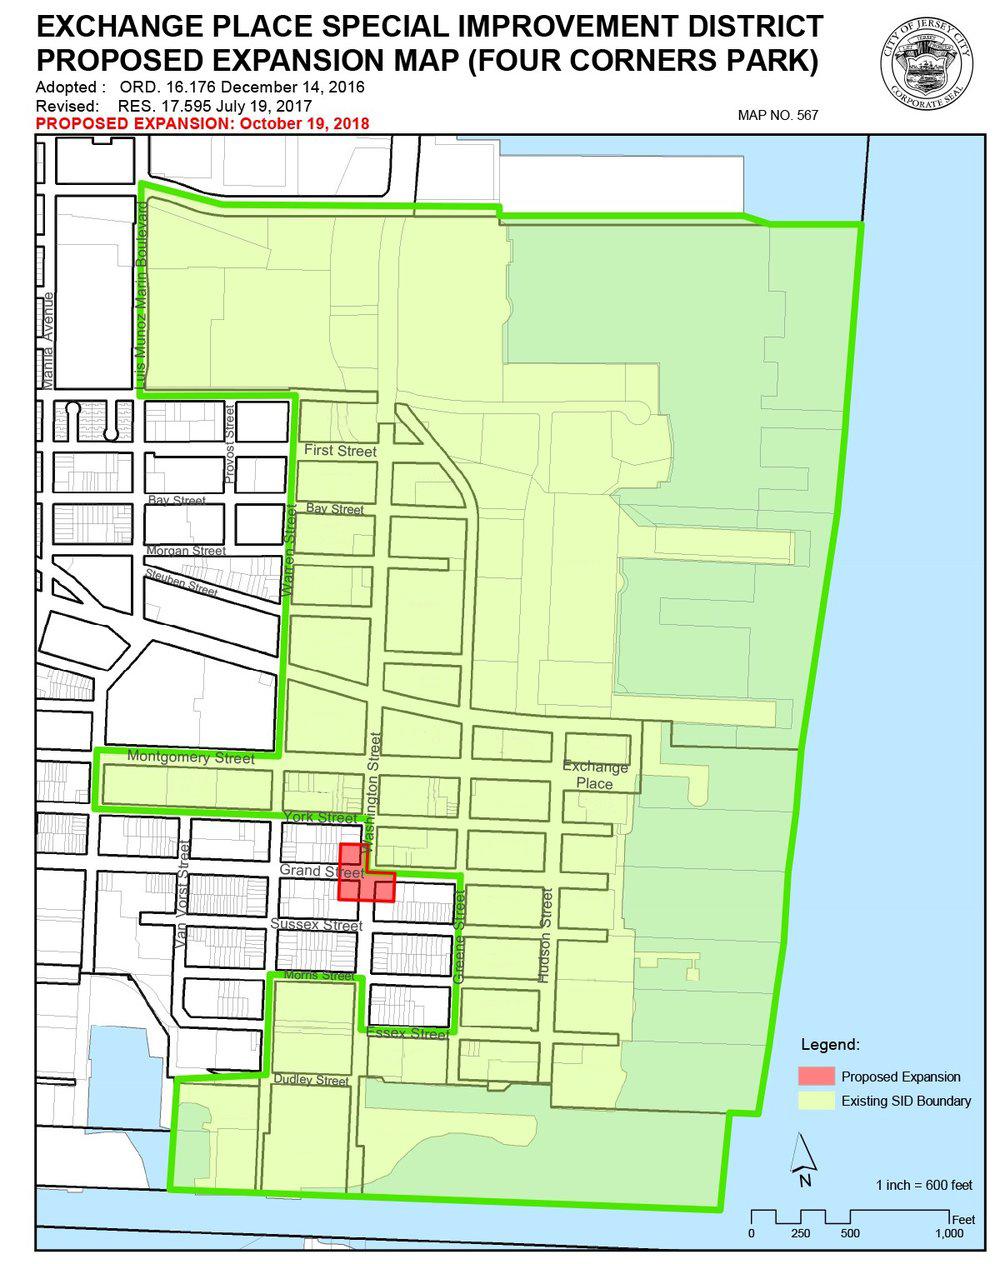 SID+Map+Boundaries+Including+4+Corners+Park.jpg